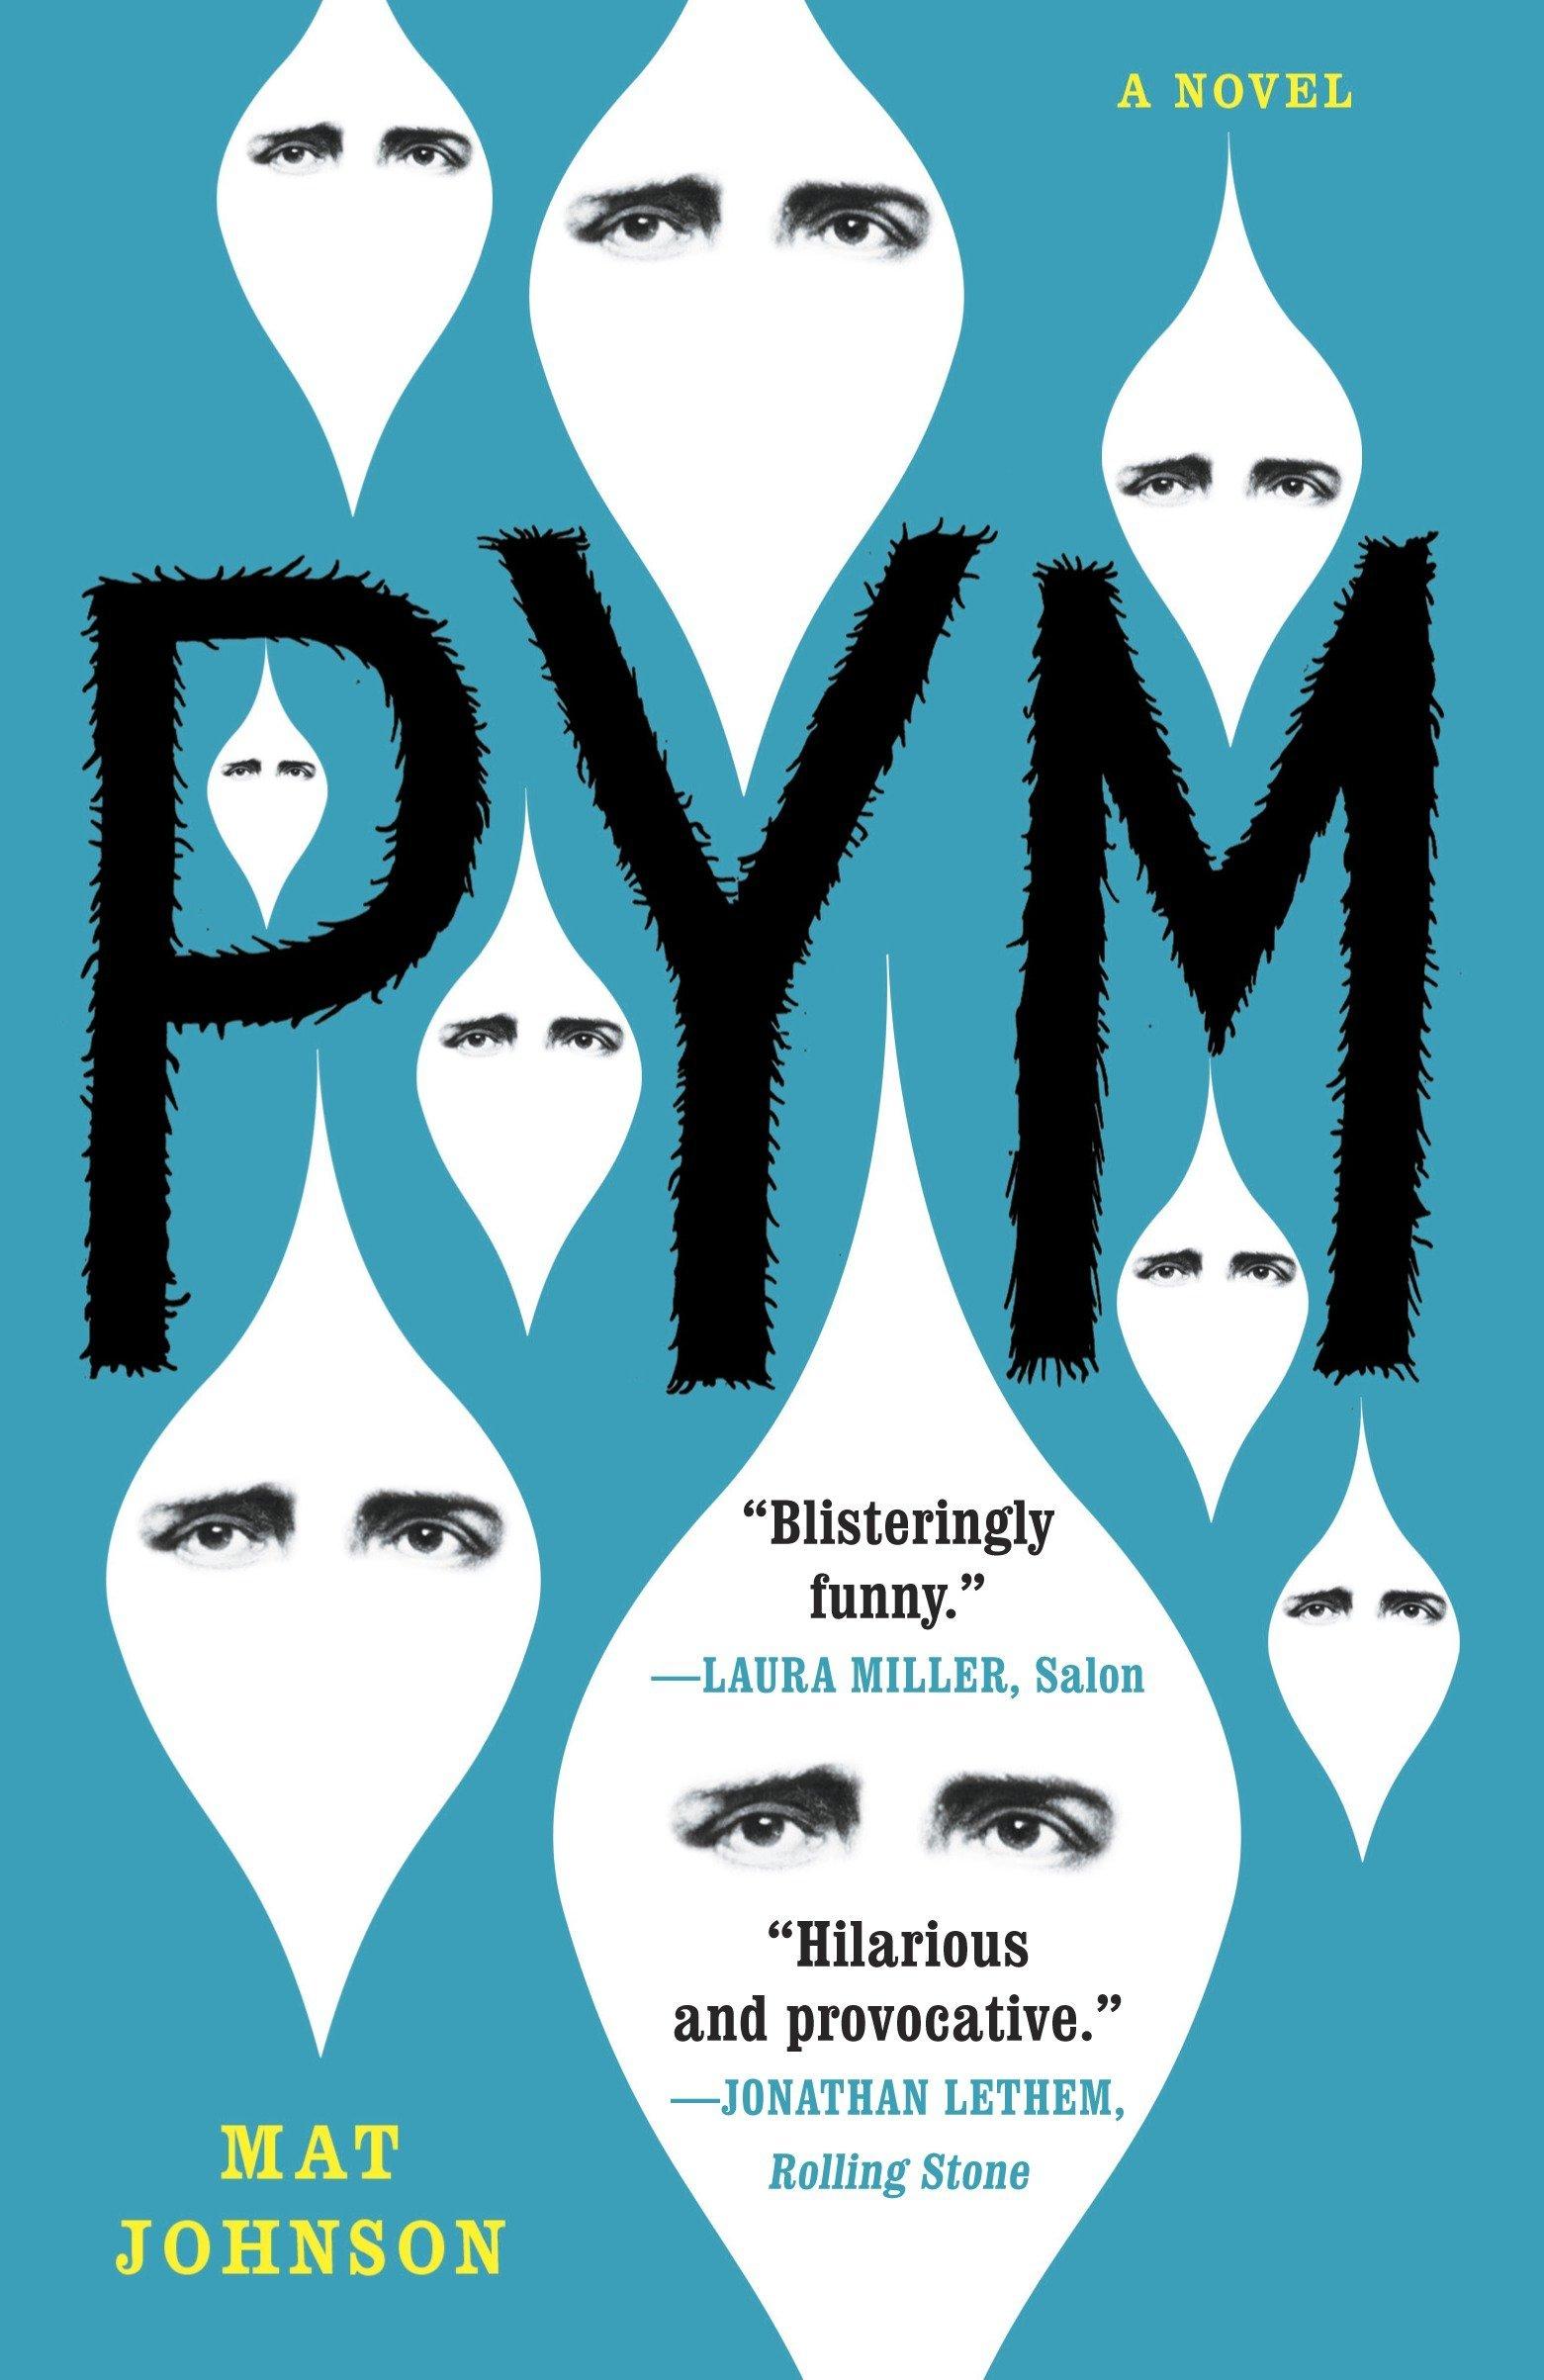 Pym A Novel Mat Johnson 9780812981766 Amazoncom Books